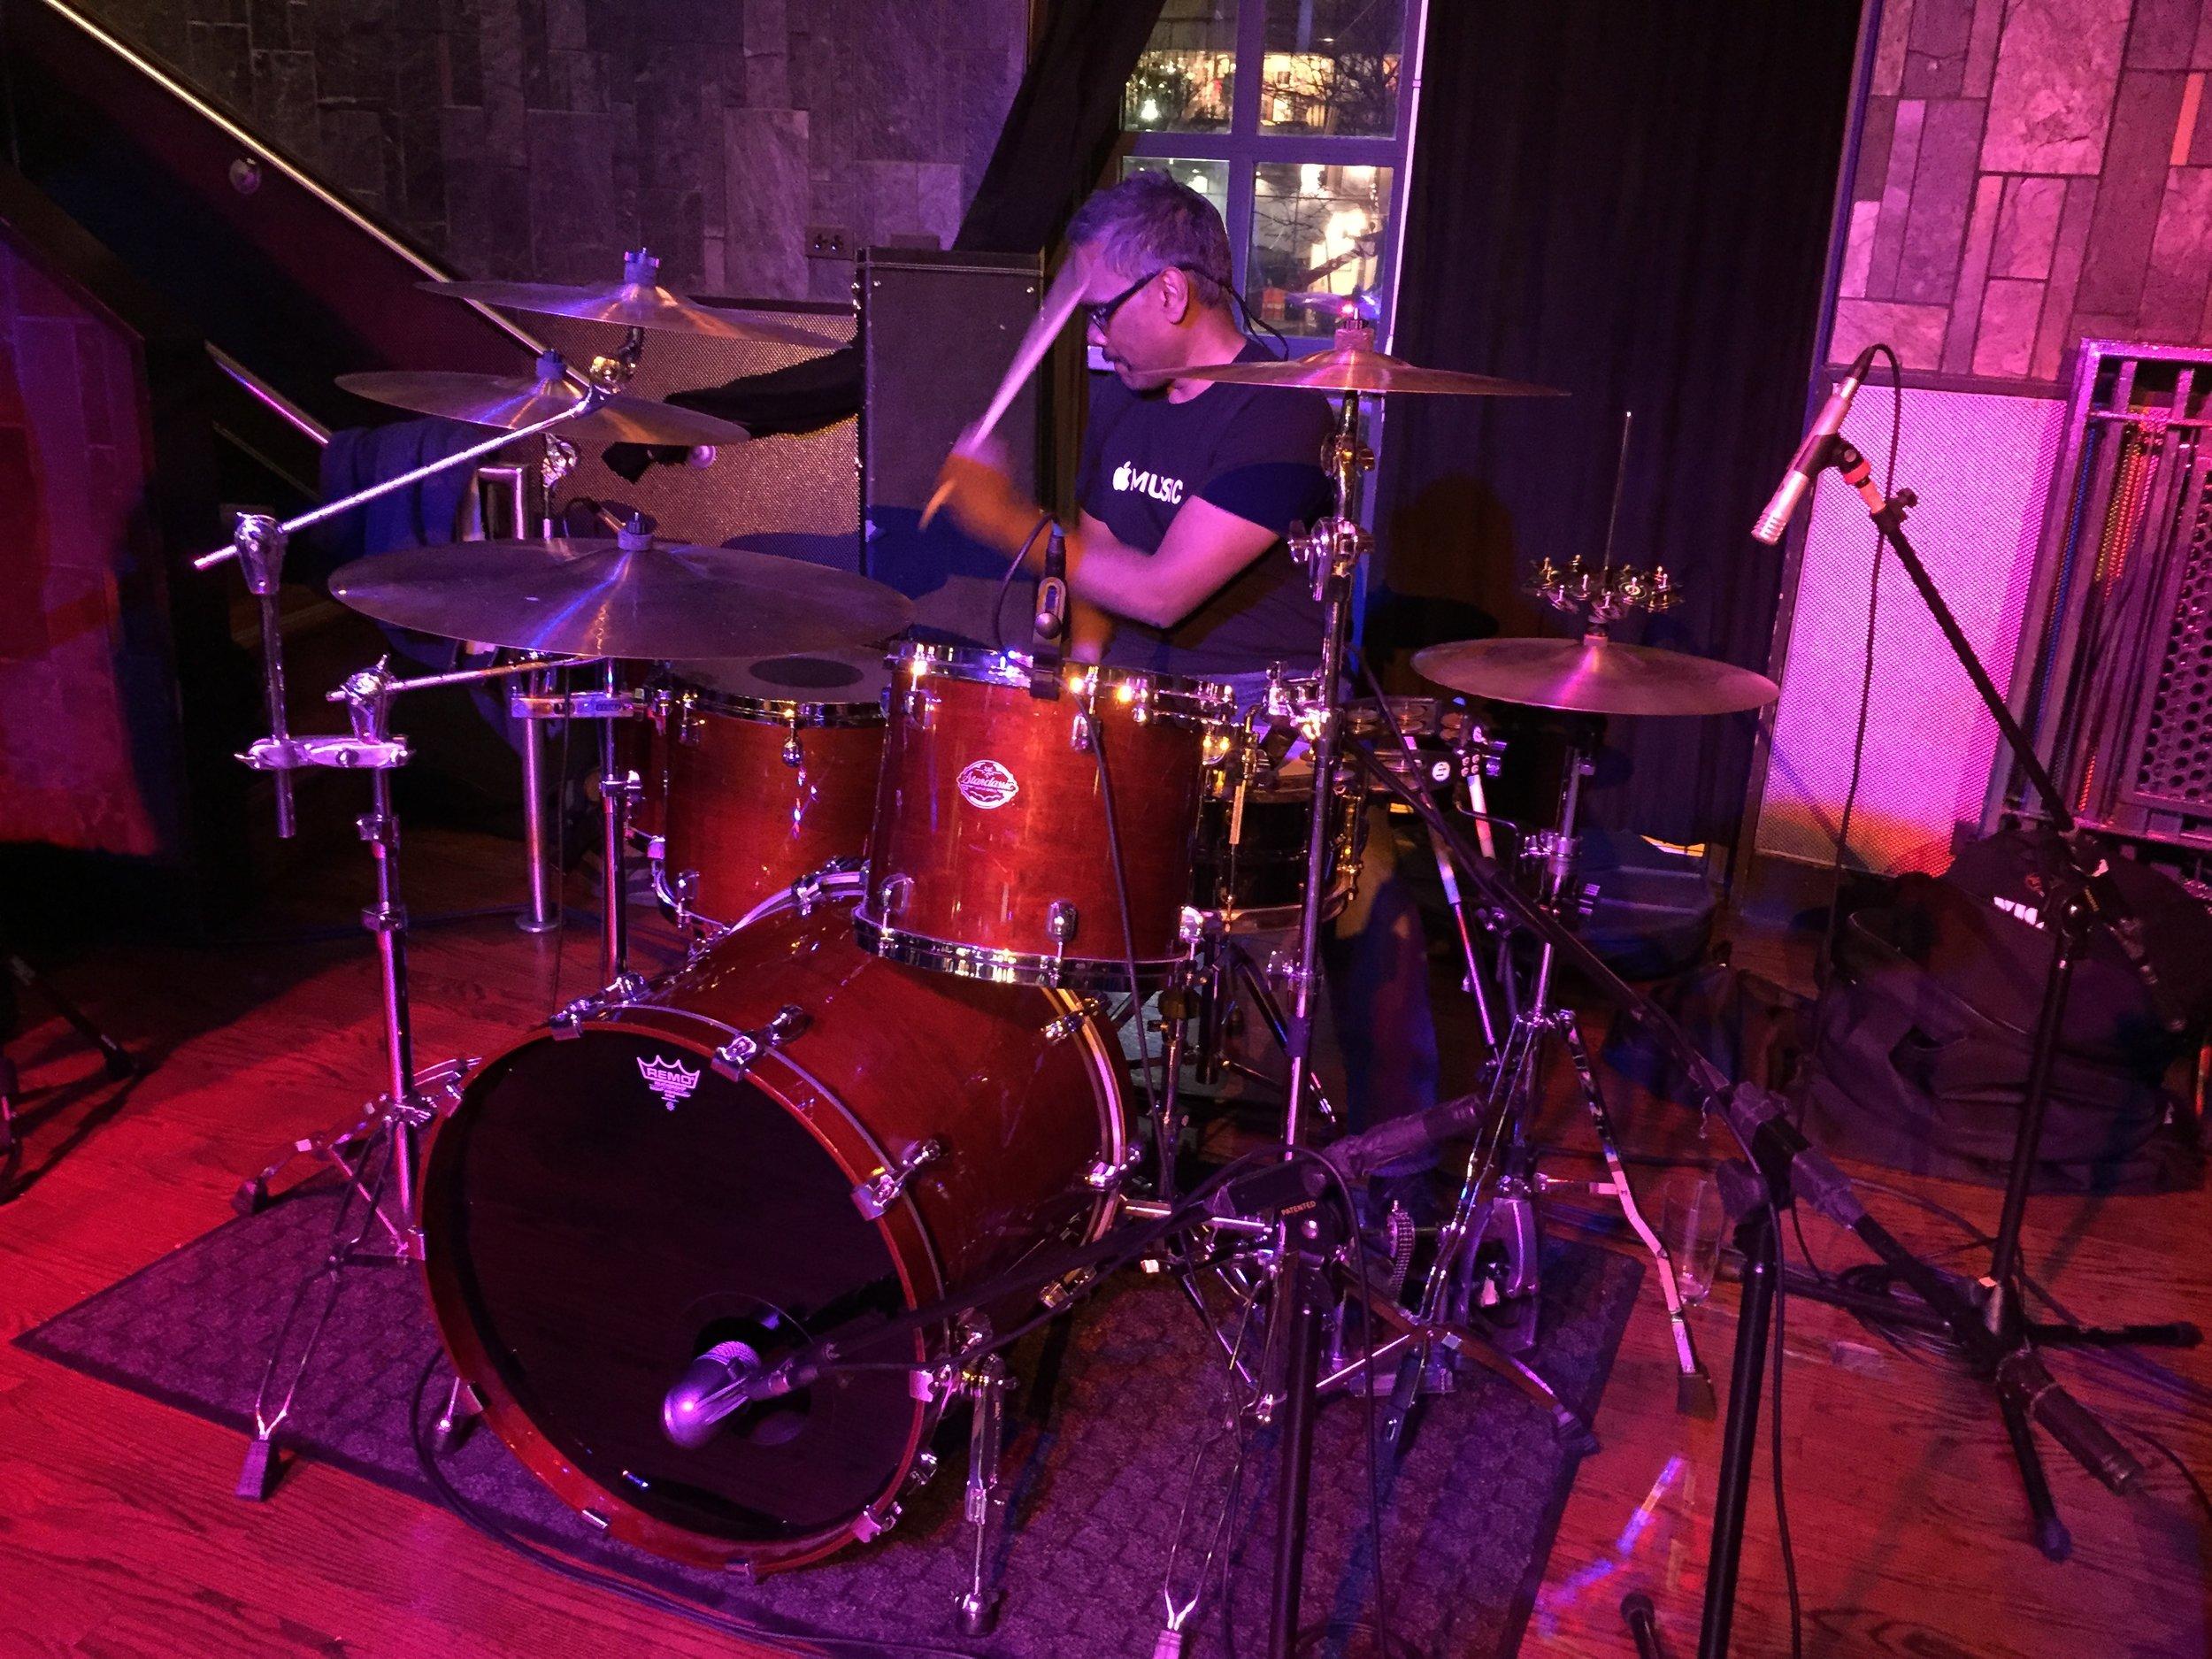 Live Band Karaoke. Hard Rock Cafe- Chicago, IL.